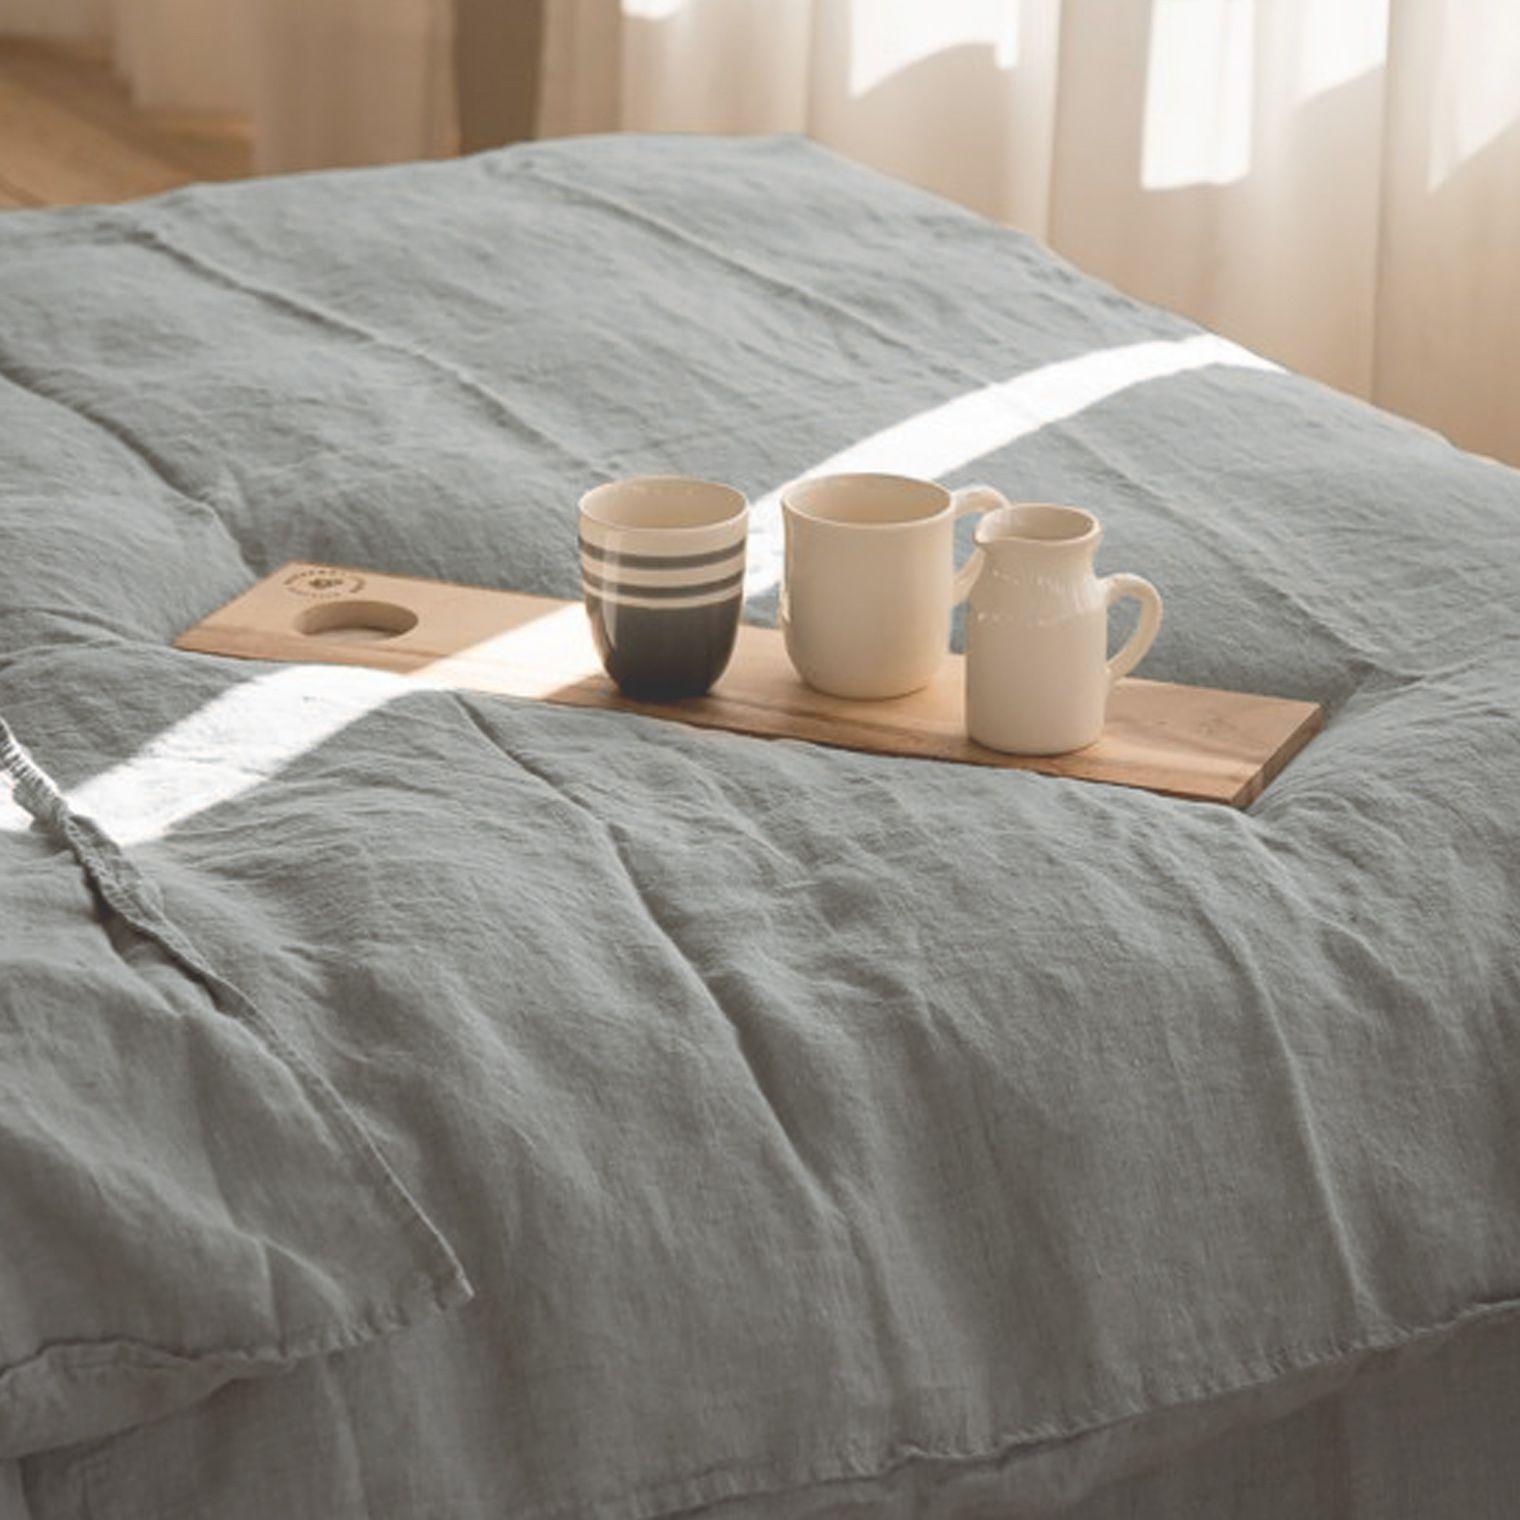 bettw sche aus leinen barefoot living by til schweiger interior bedroom decor textilien. Black Bedroom Furniture Sets. Home Design Ideas